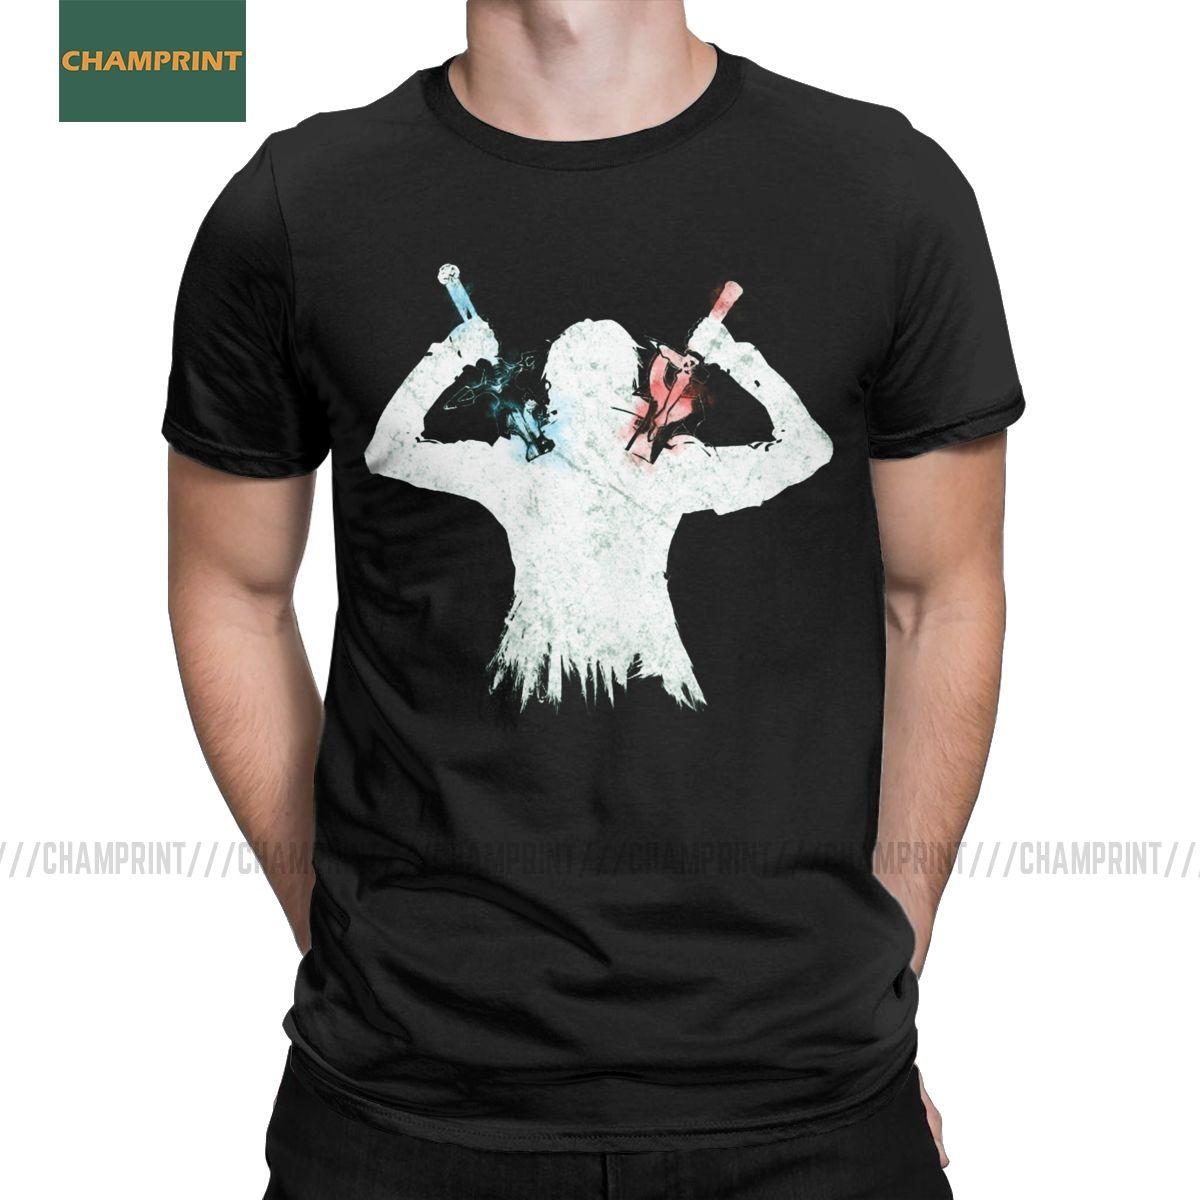 Hommes T-Shirts double Lames épée d'art en ligne impressionnant coton T-shirt à manches courtes Asuna Kirito Manga Anime Yuuki jeu Sao T-shirt